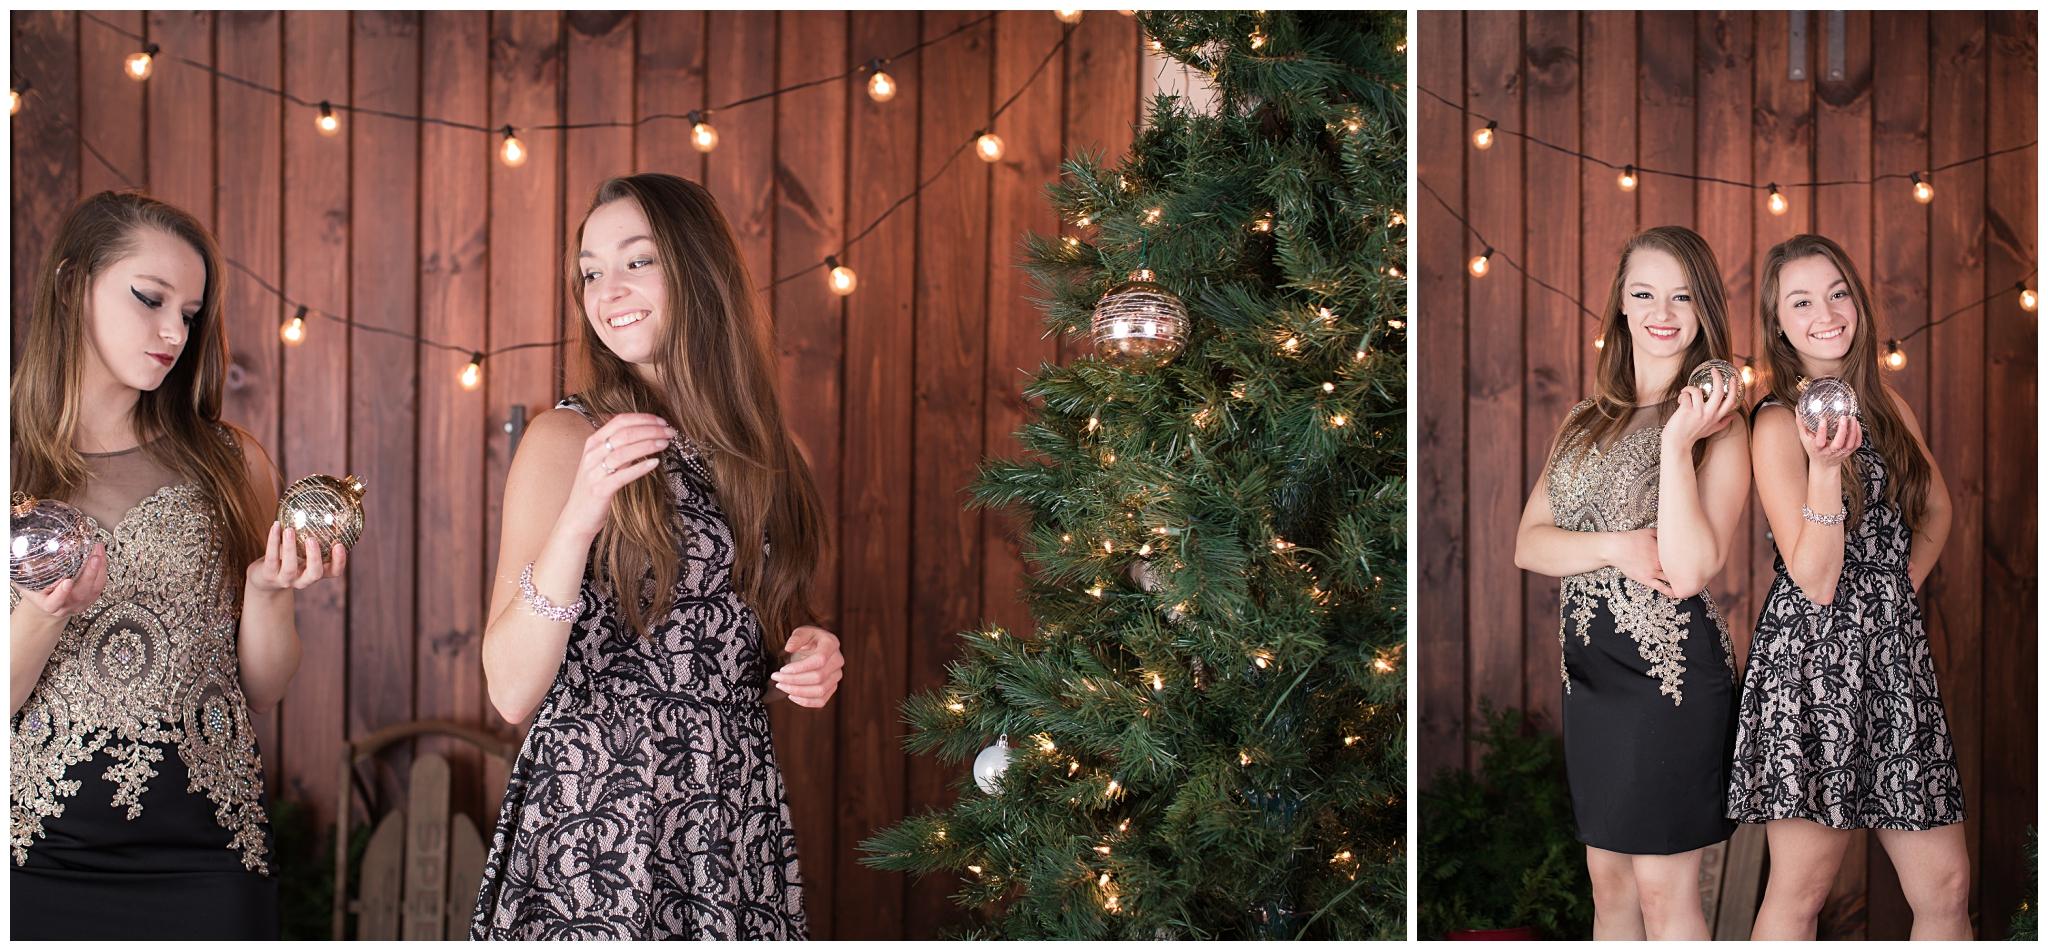 ChristmasMiniSessions_family-baby-kids_Berks-County-Reading-PA_0007.jpg